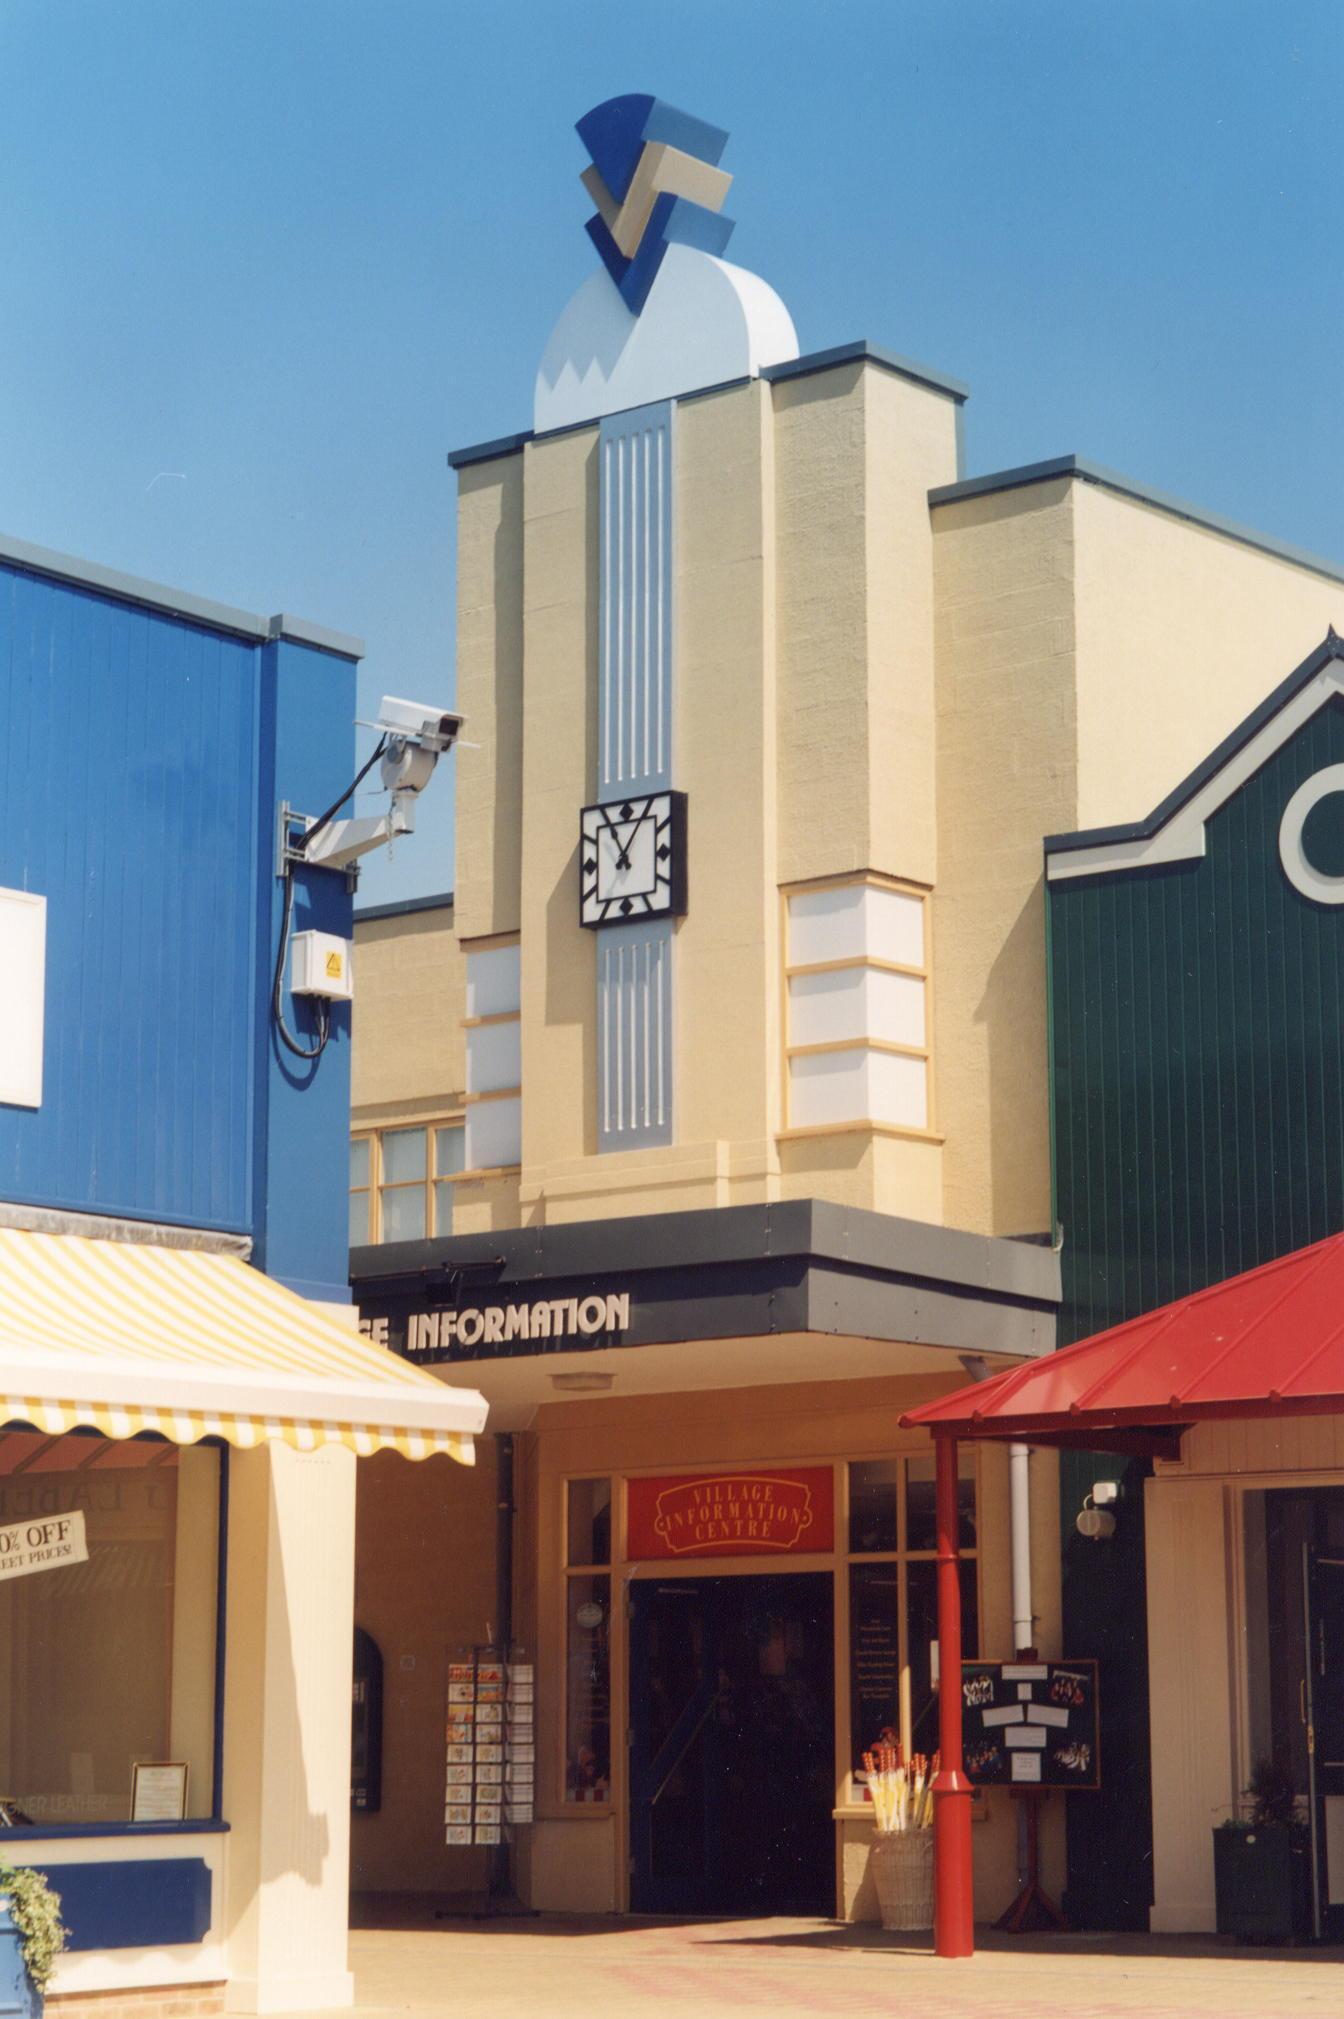 Art Deco clock on a cinema